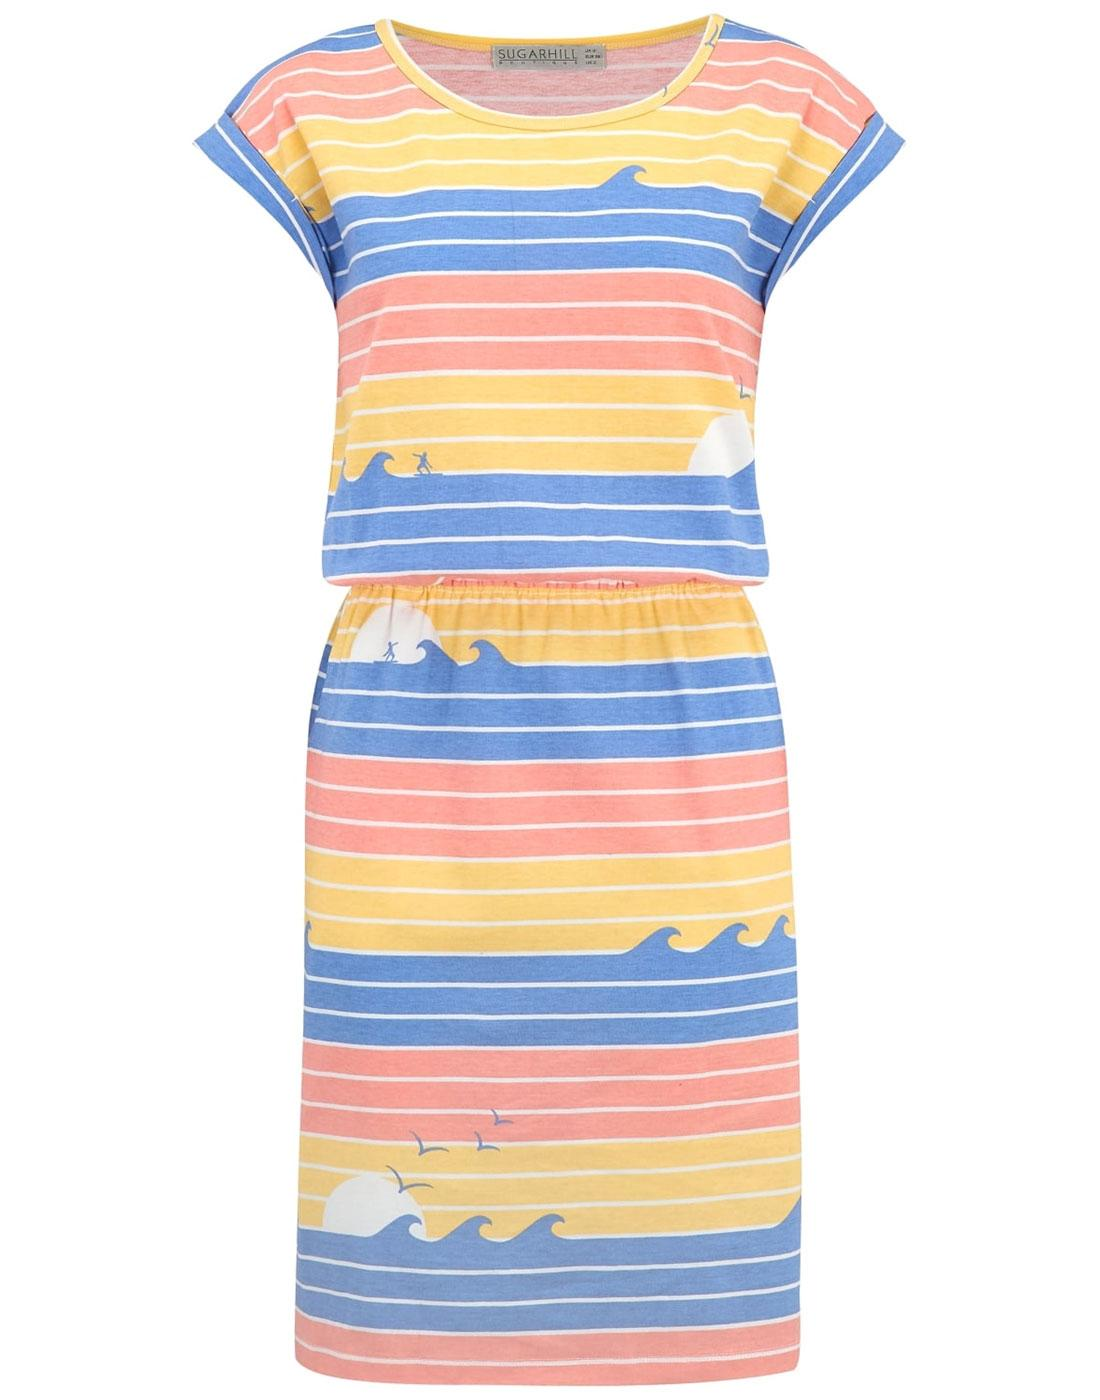 Kate SUGARHILL BOUTIQUE Retro Waves Summer Dress